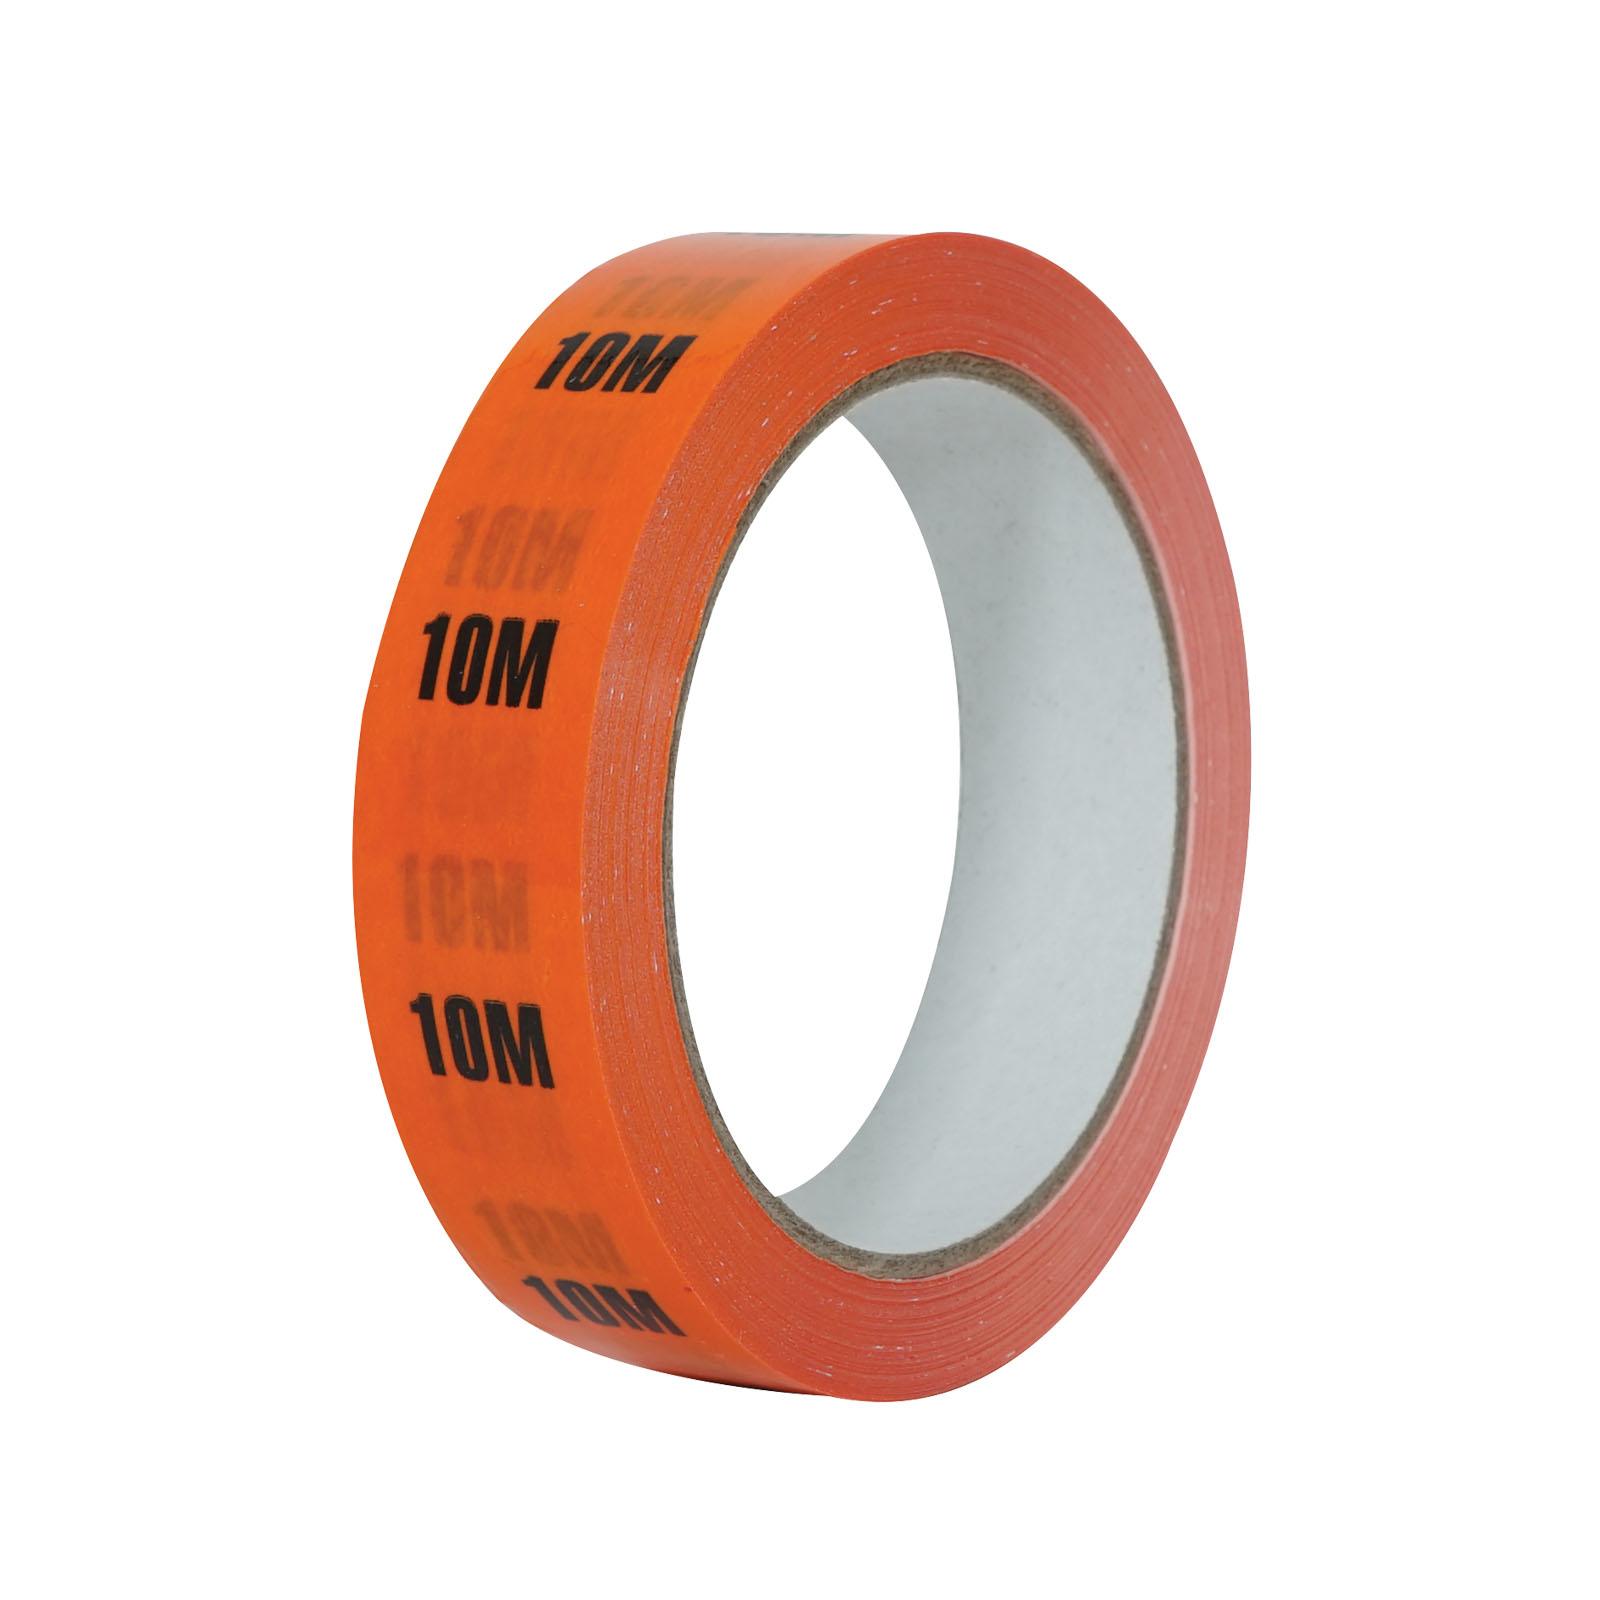 10m Orange Cable Length ID Tape 24mm x 33m